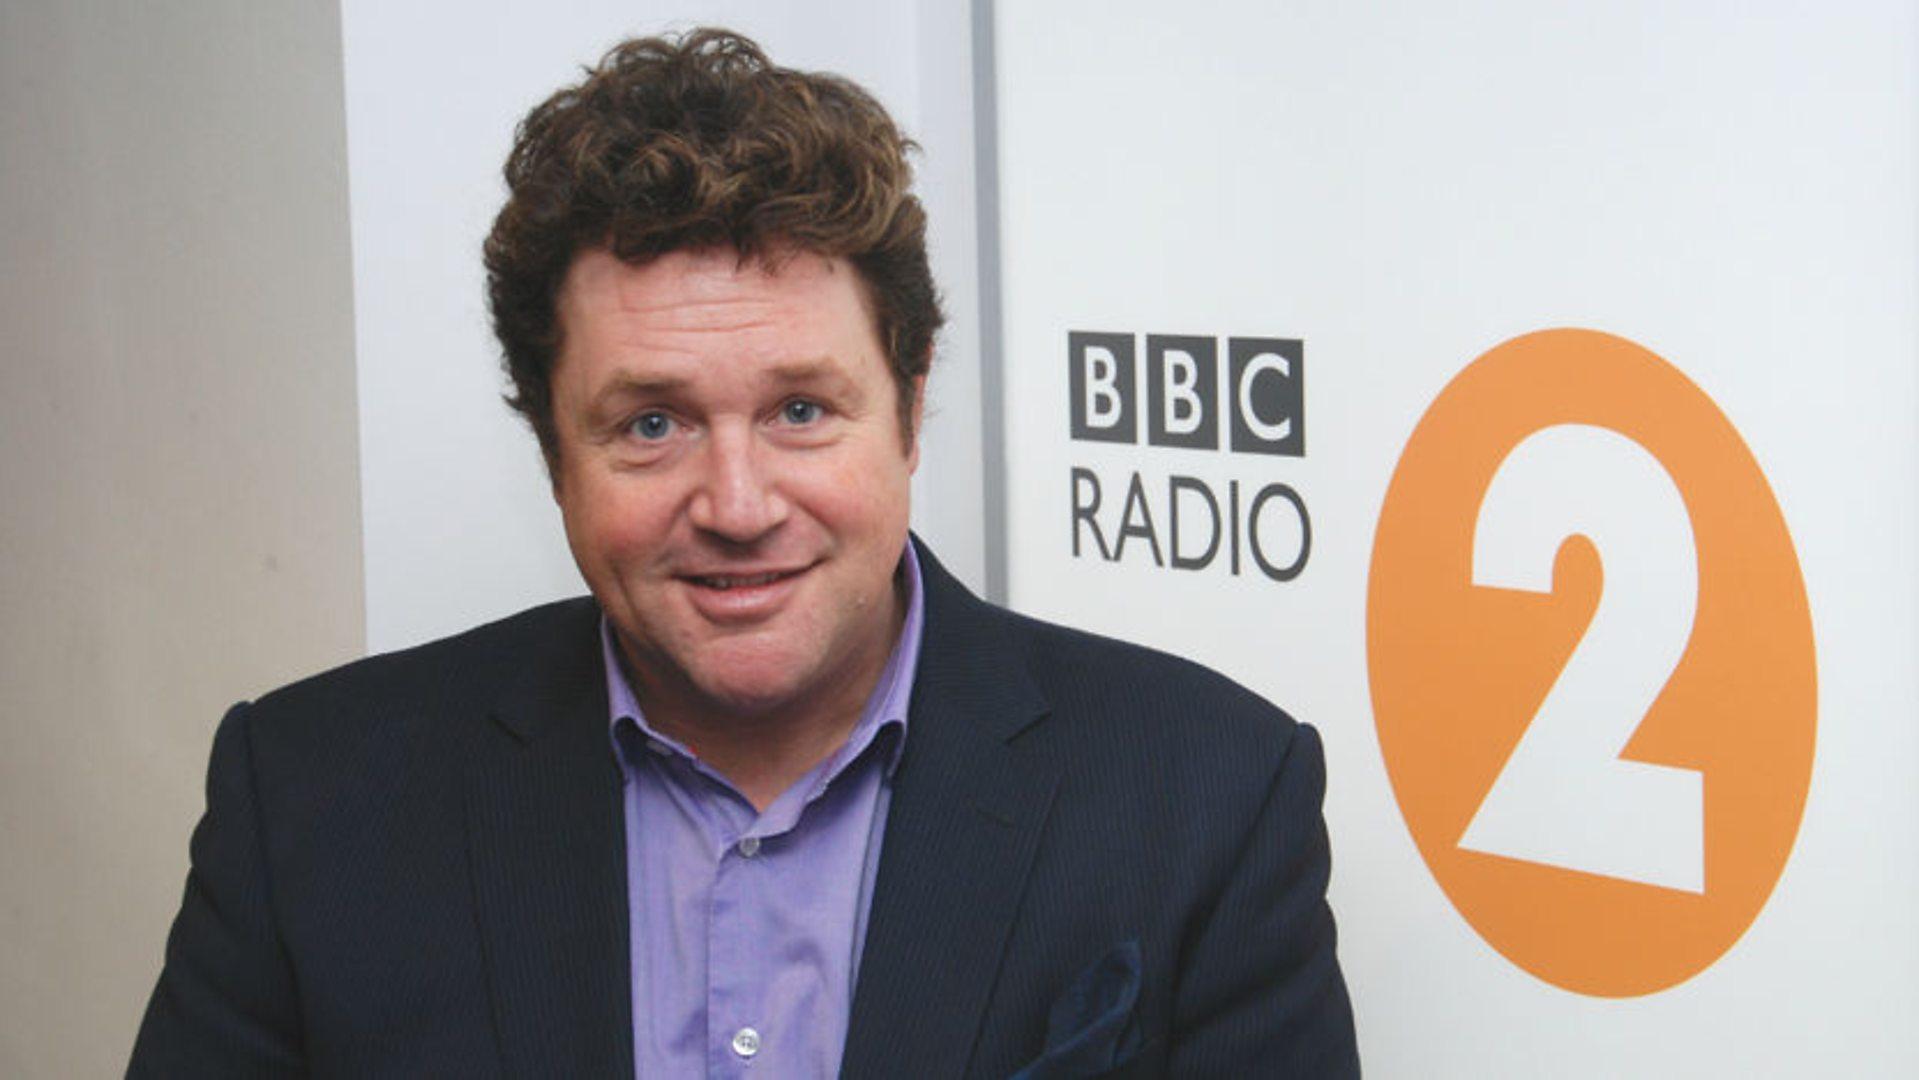 michael ball bbc radio 2 the savoy.jpg